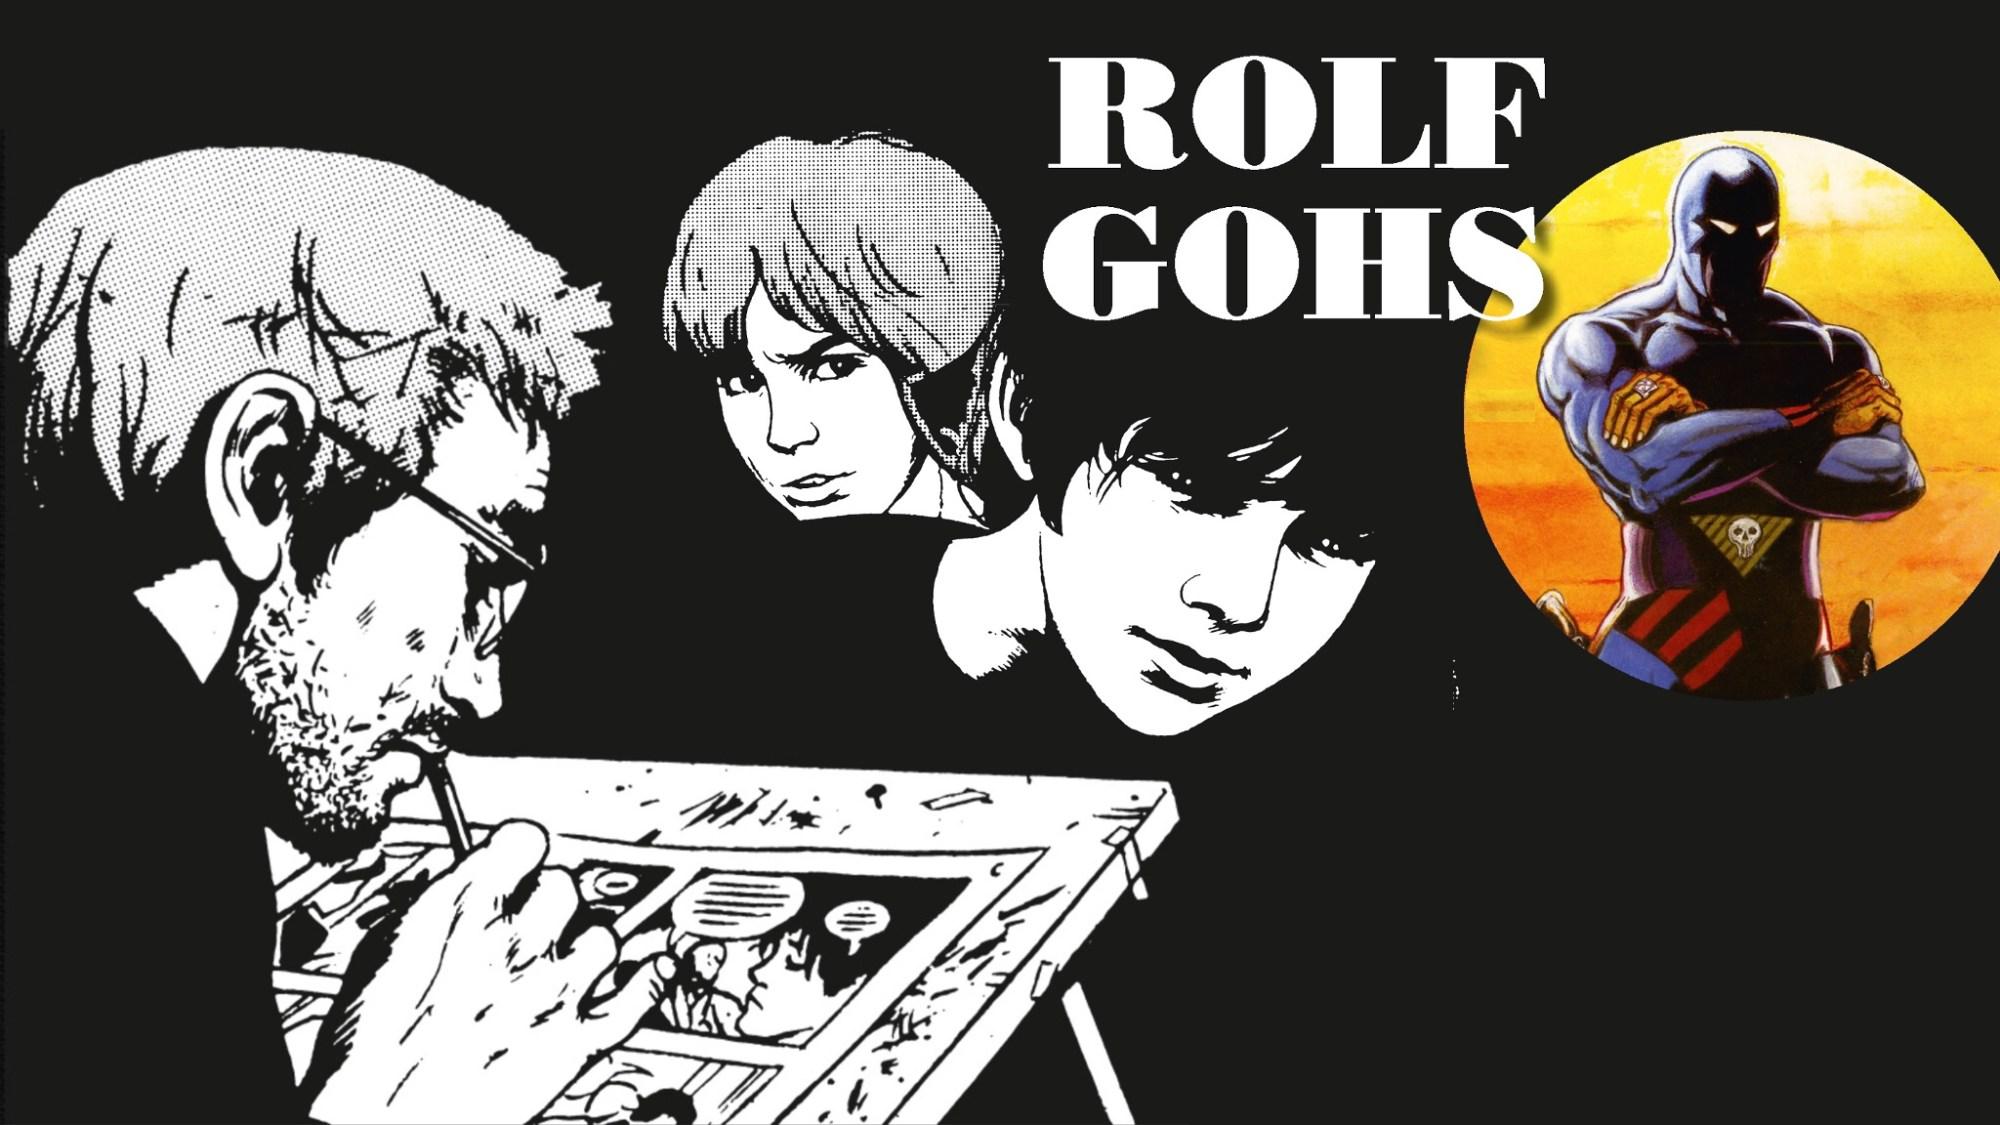 Rolf Gohs